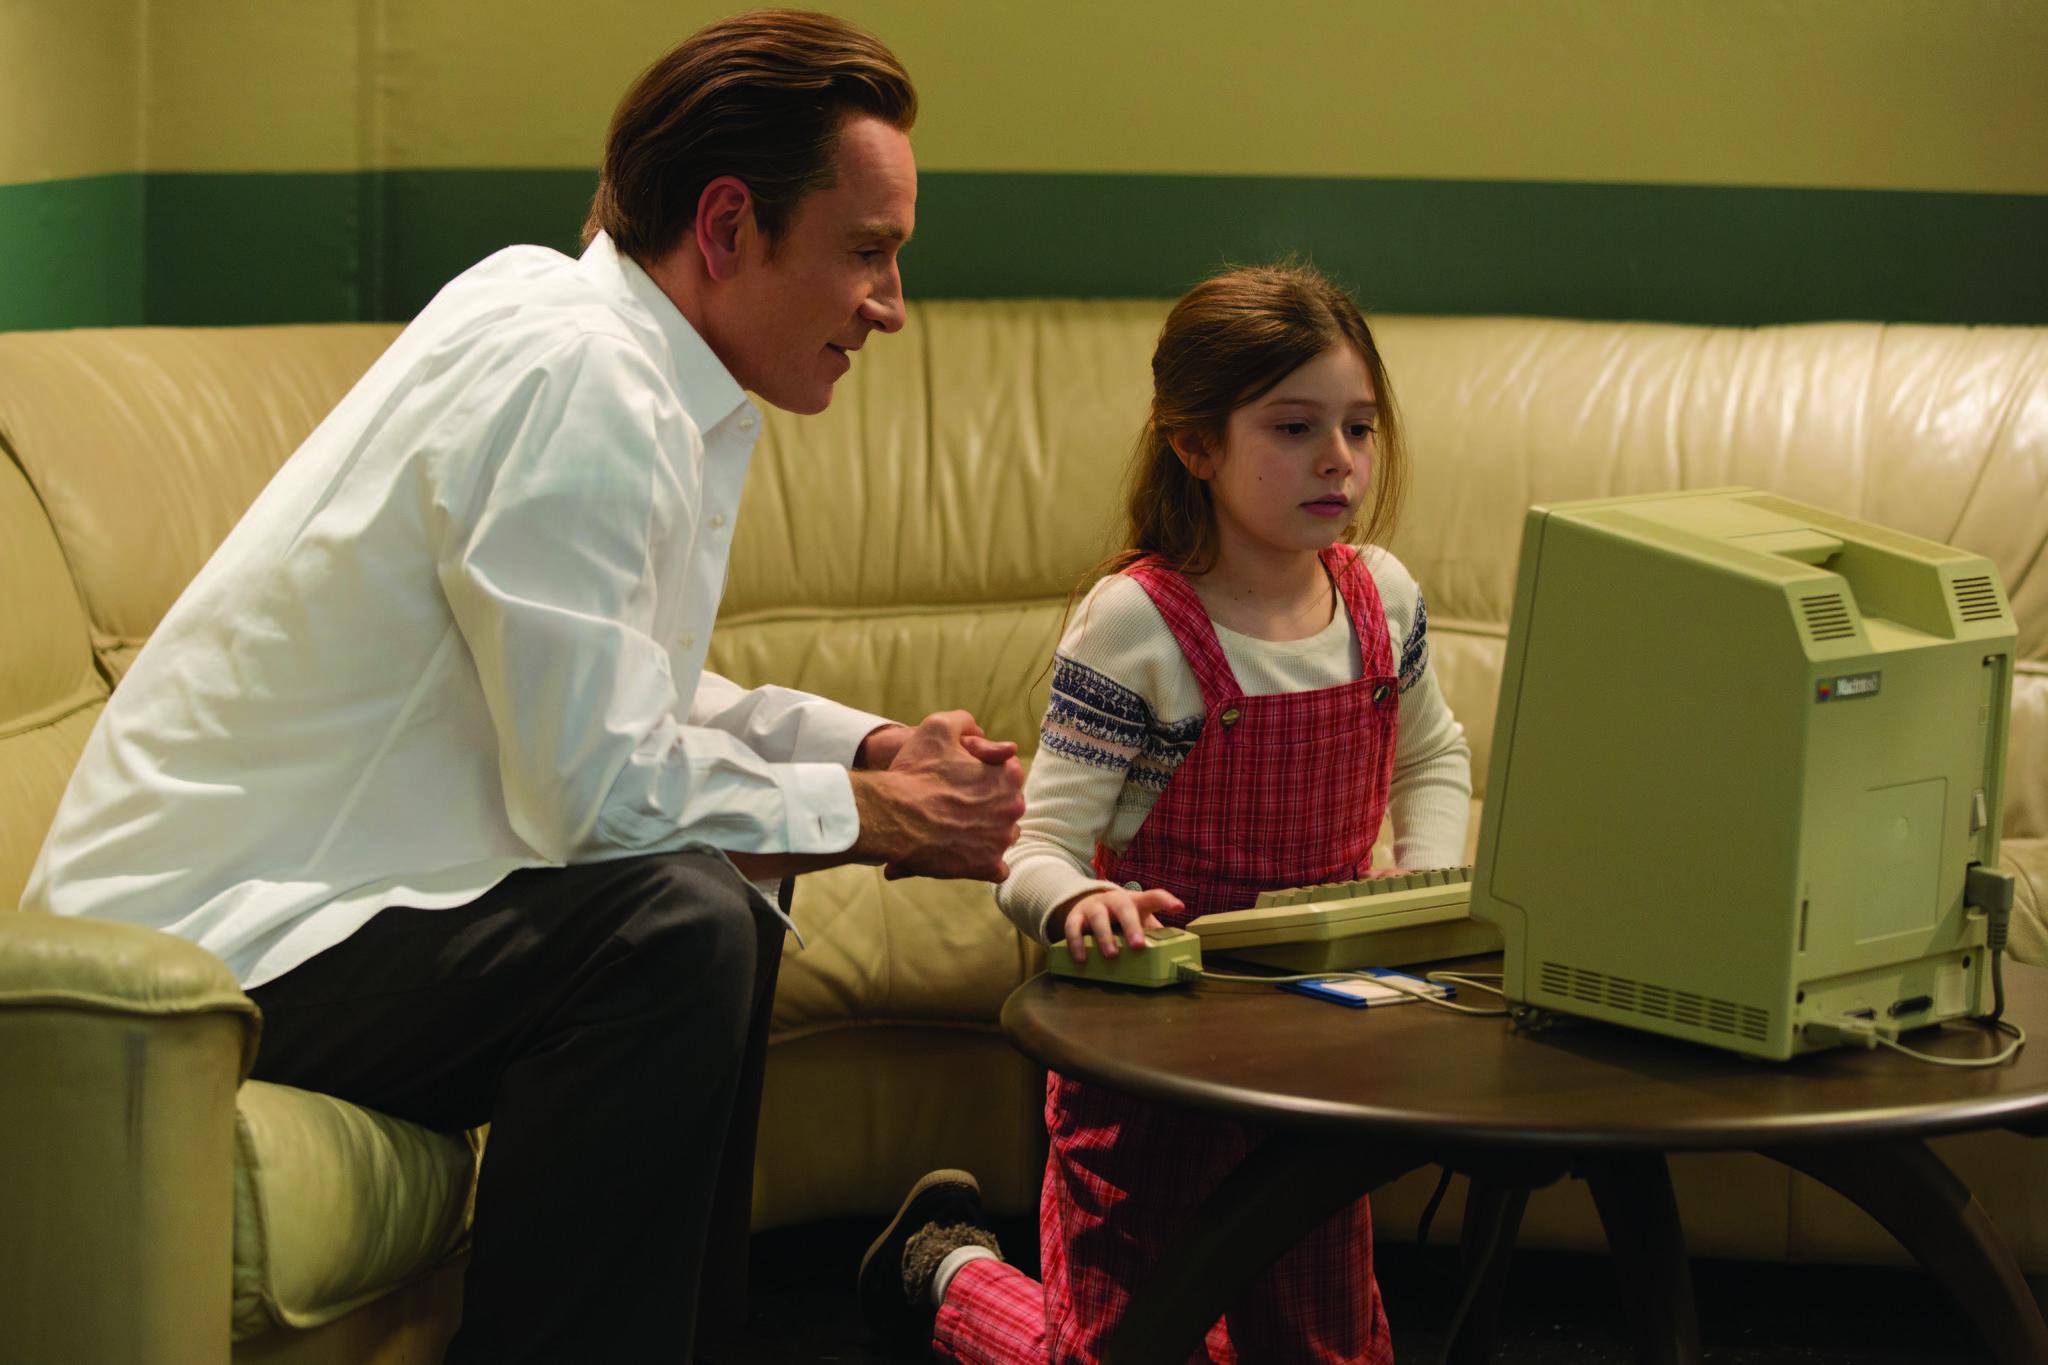 Michael Fassbender and Makenzie Moss in Steve Jobs (2015)